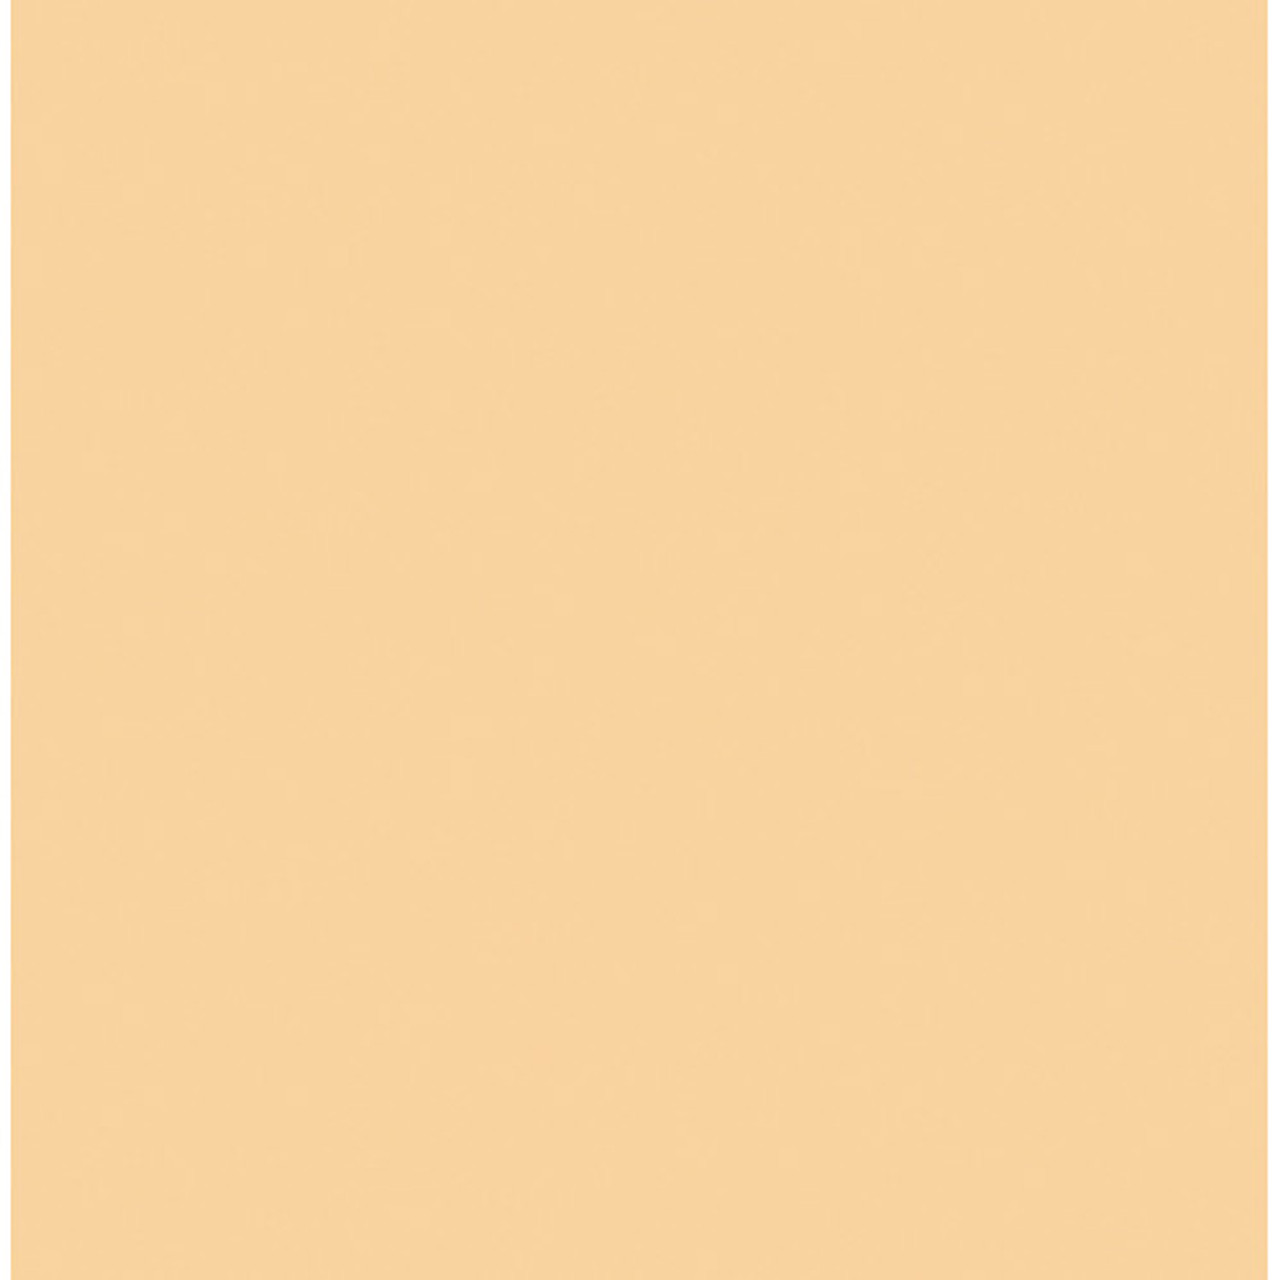 Rosco Cinegel Sheet #3442: Half Straw (1/2 CTS), Gels